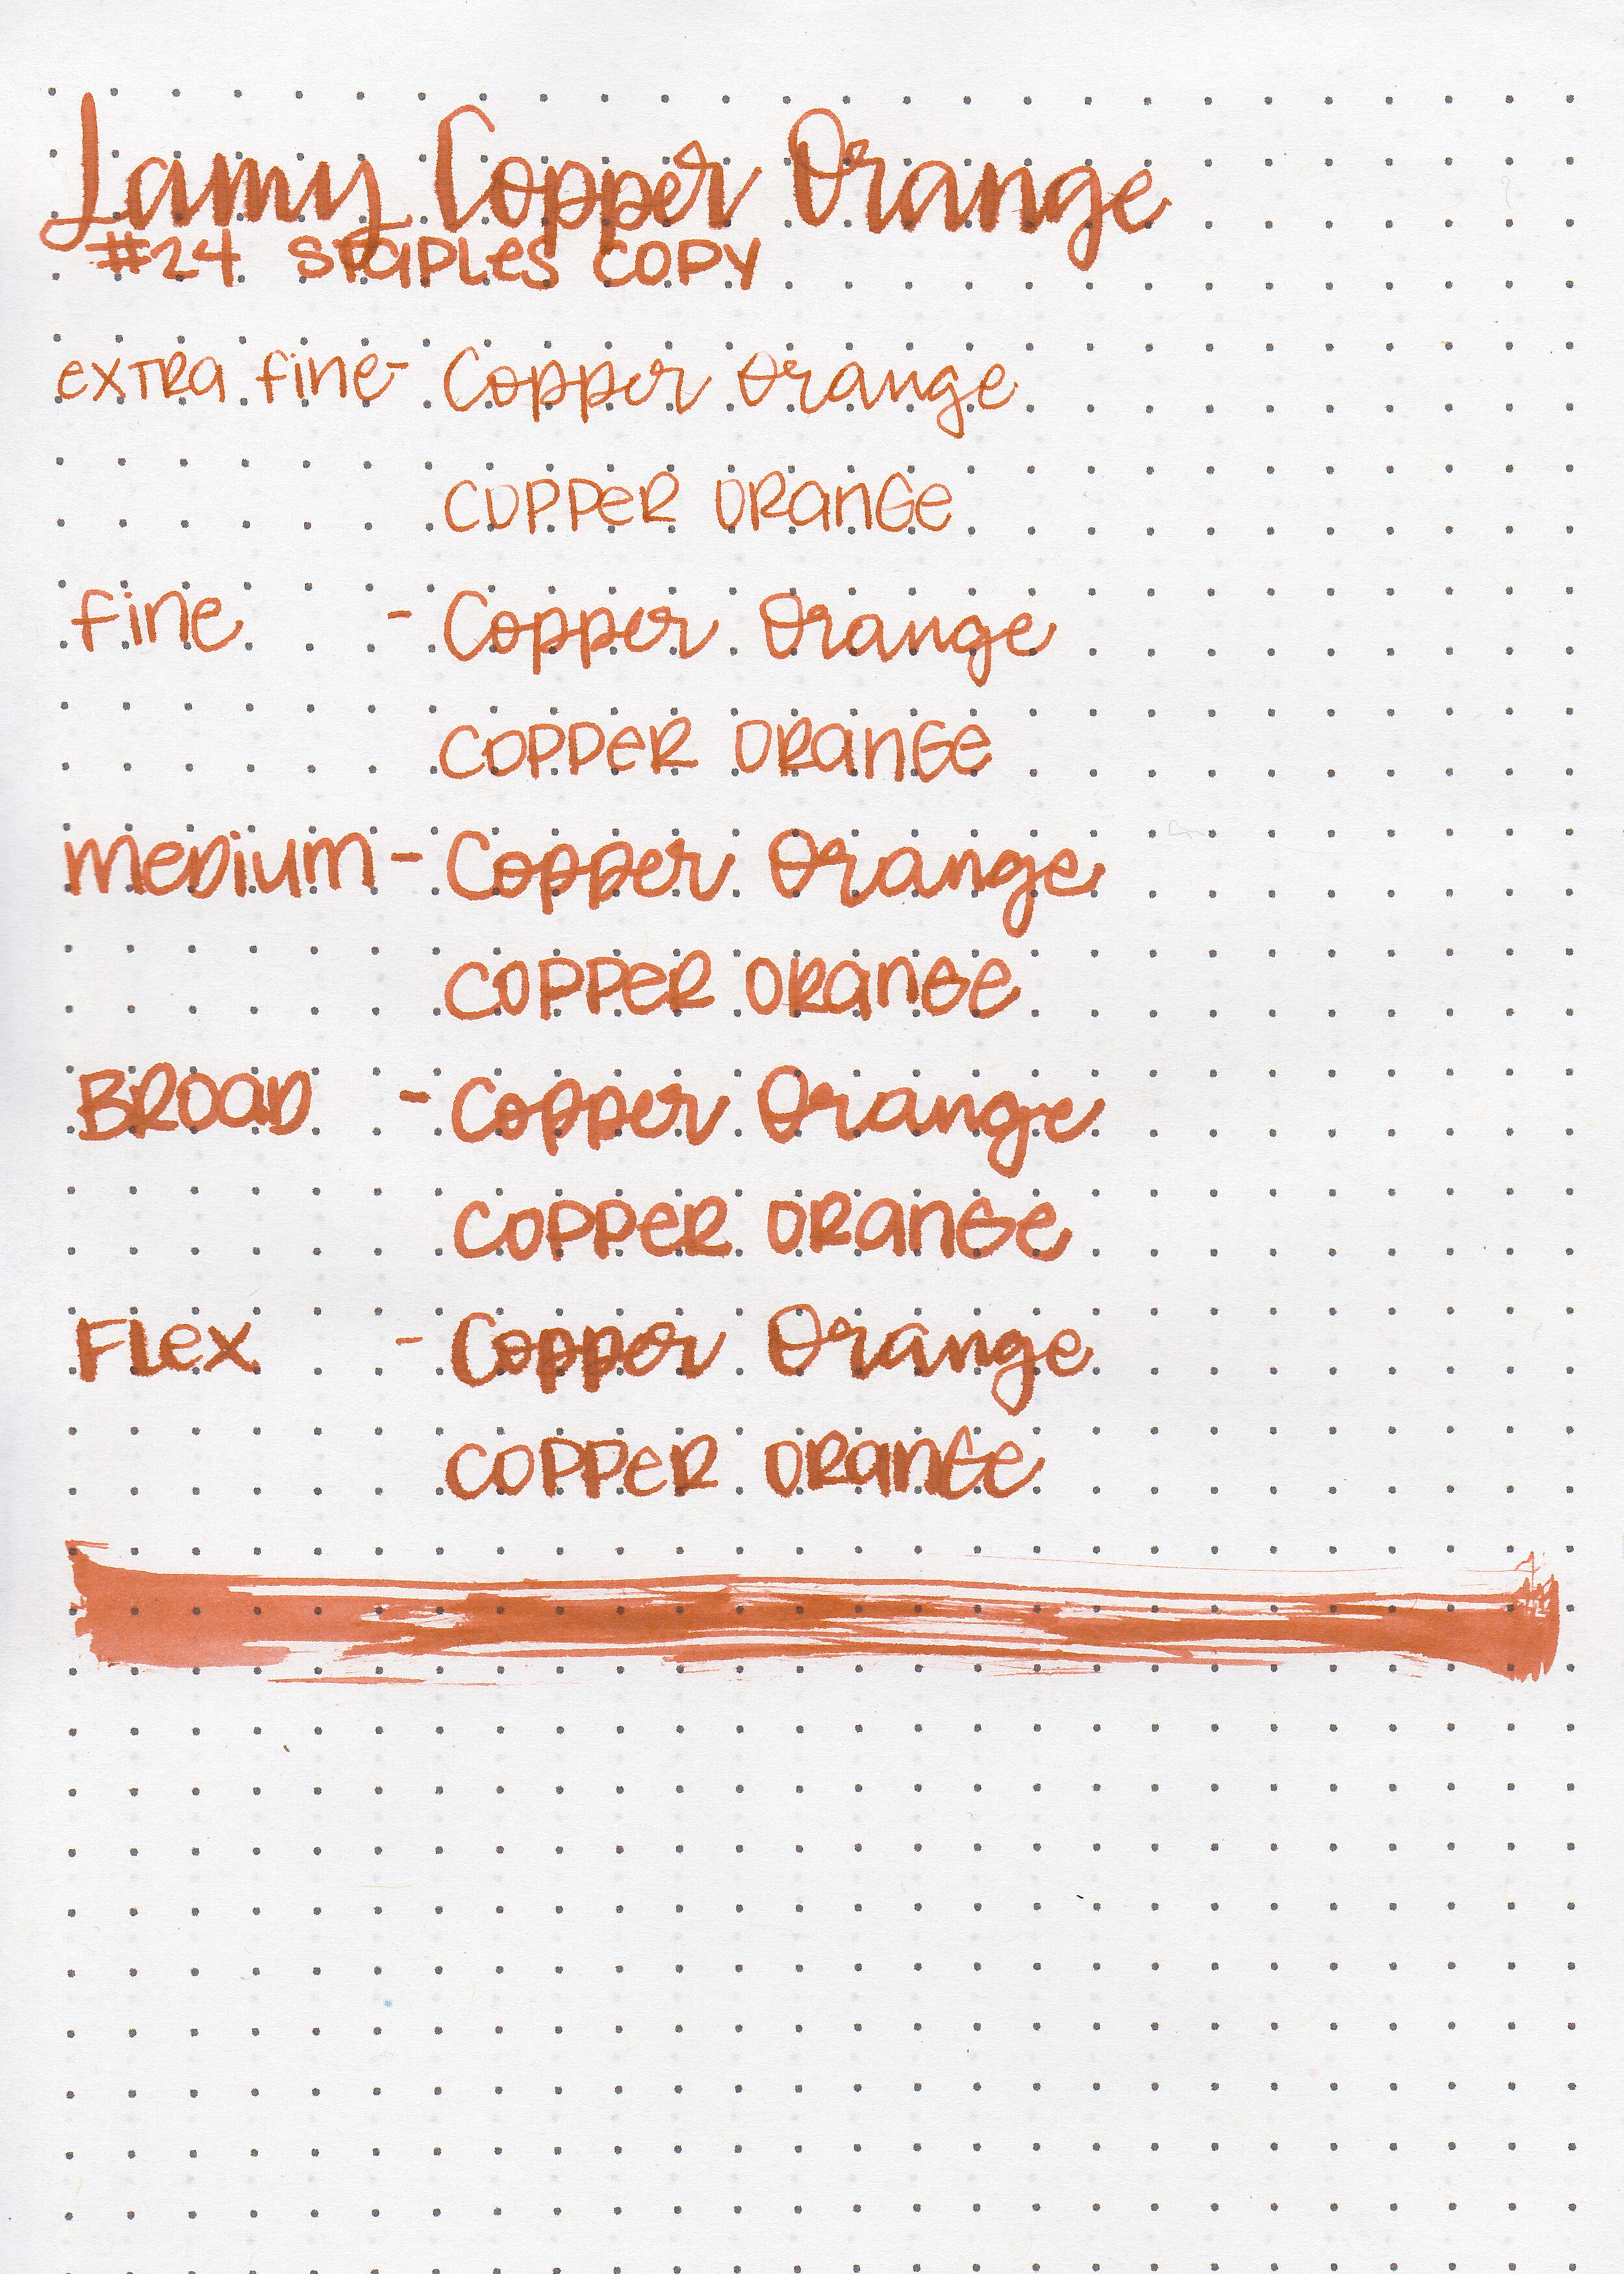 lmy-copper-orange-11.jpg